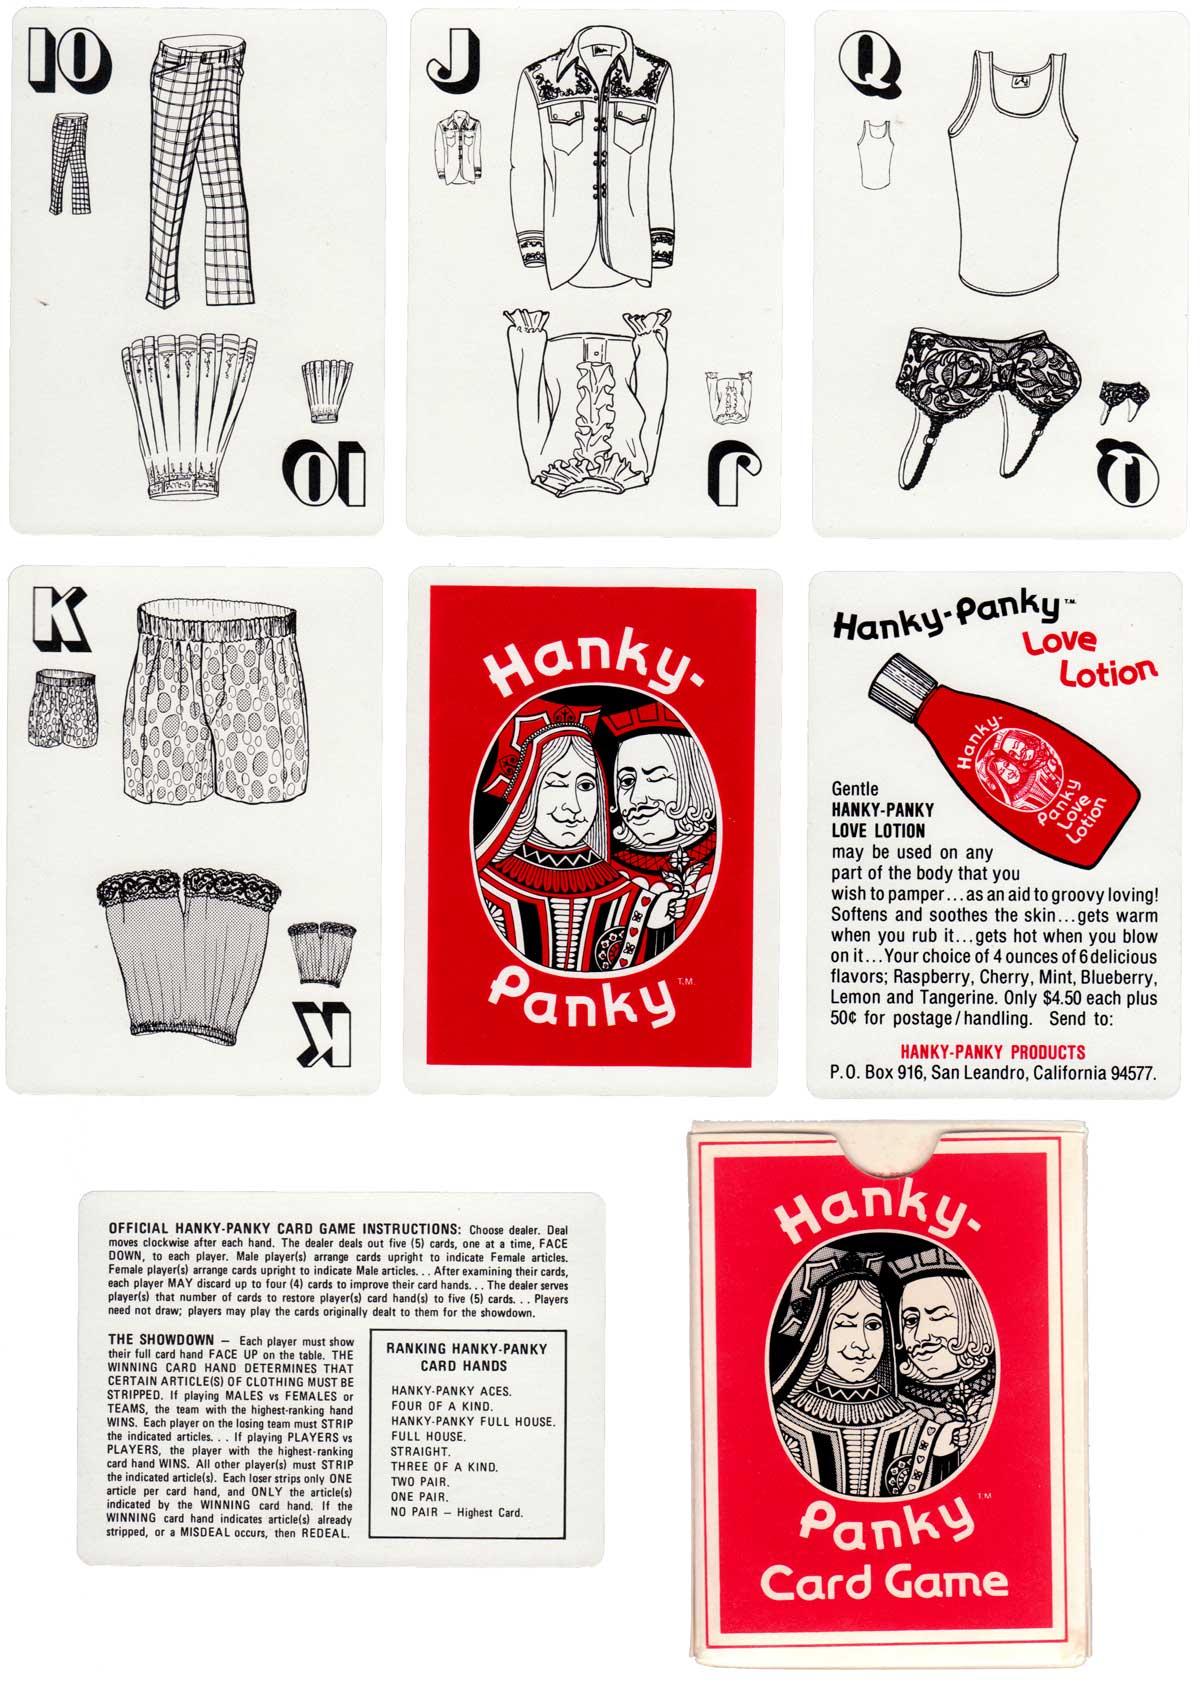 Hanky-Panky card game, c.1975